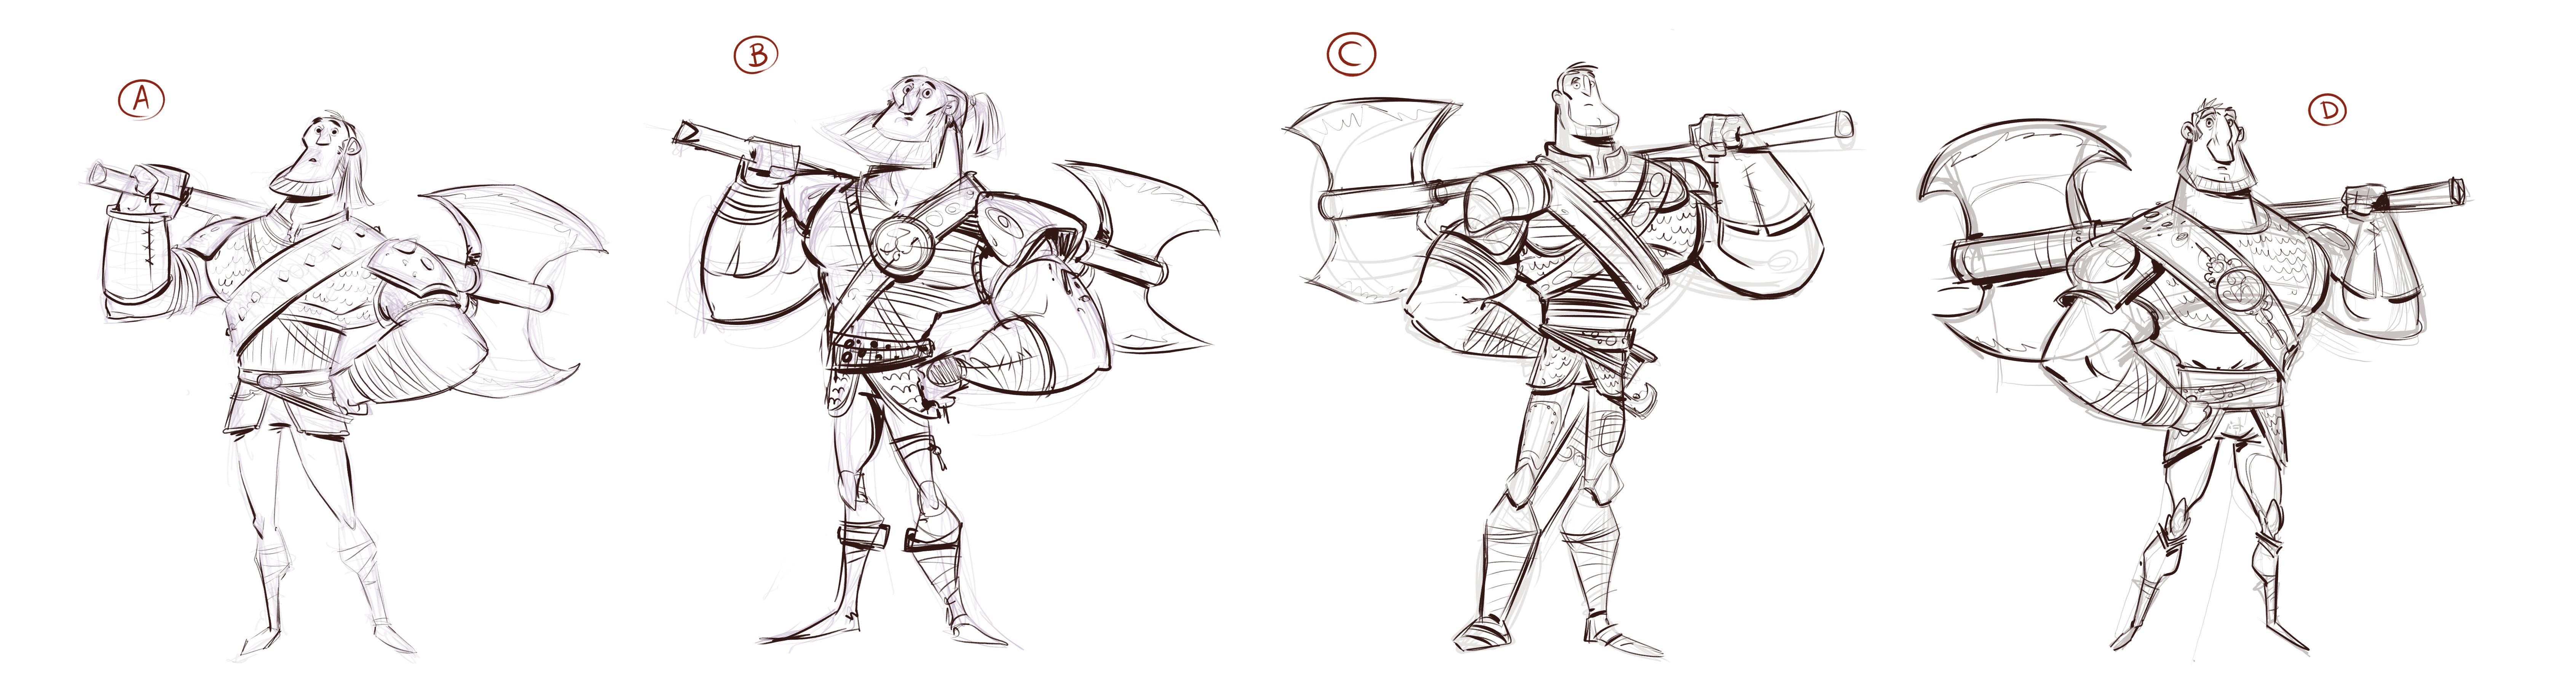 concepts 1